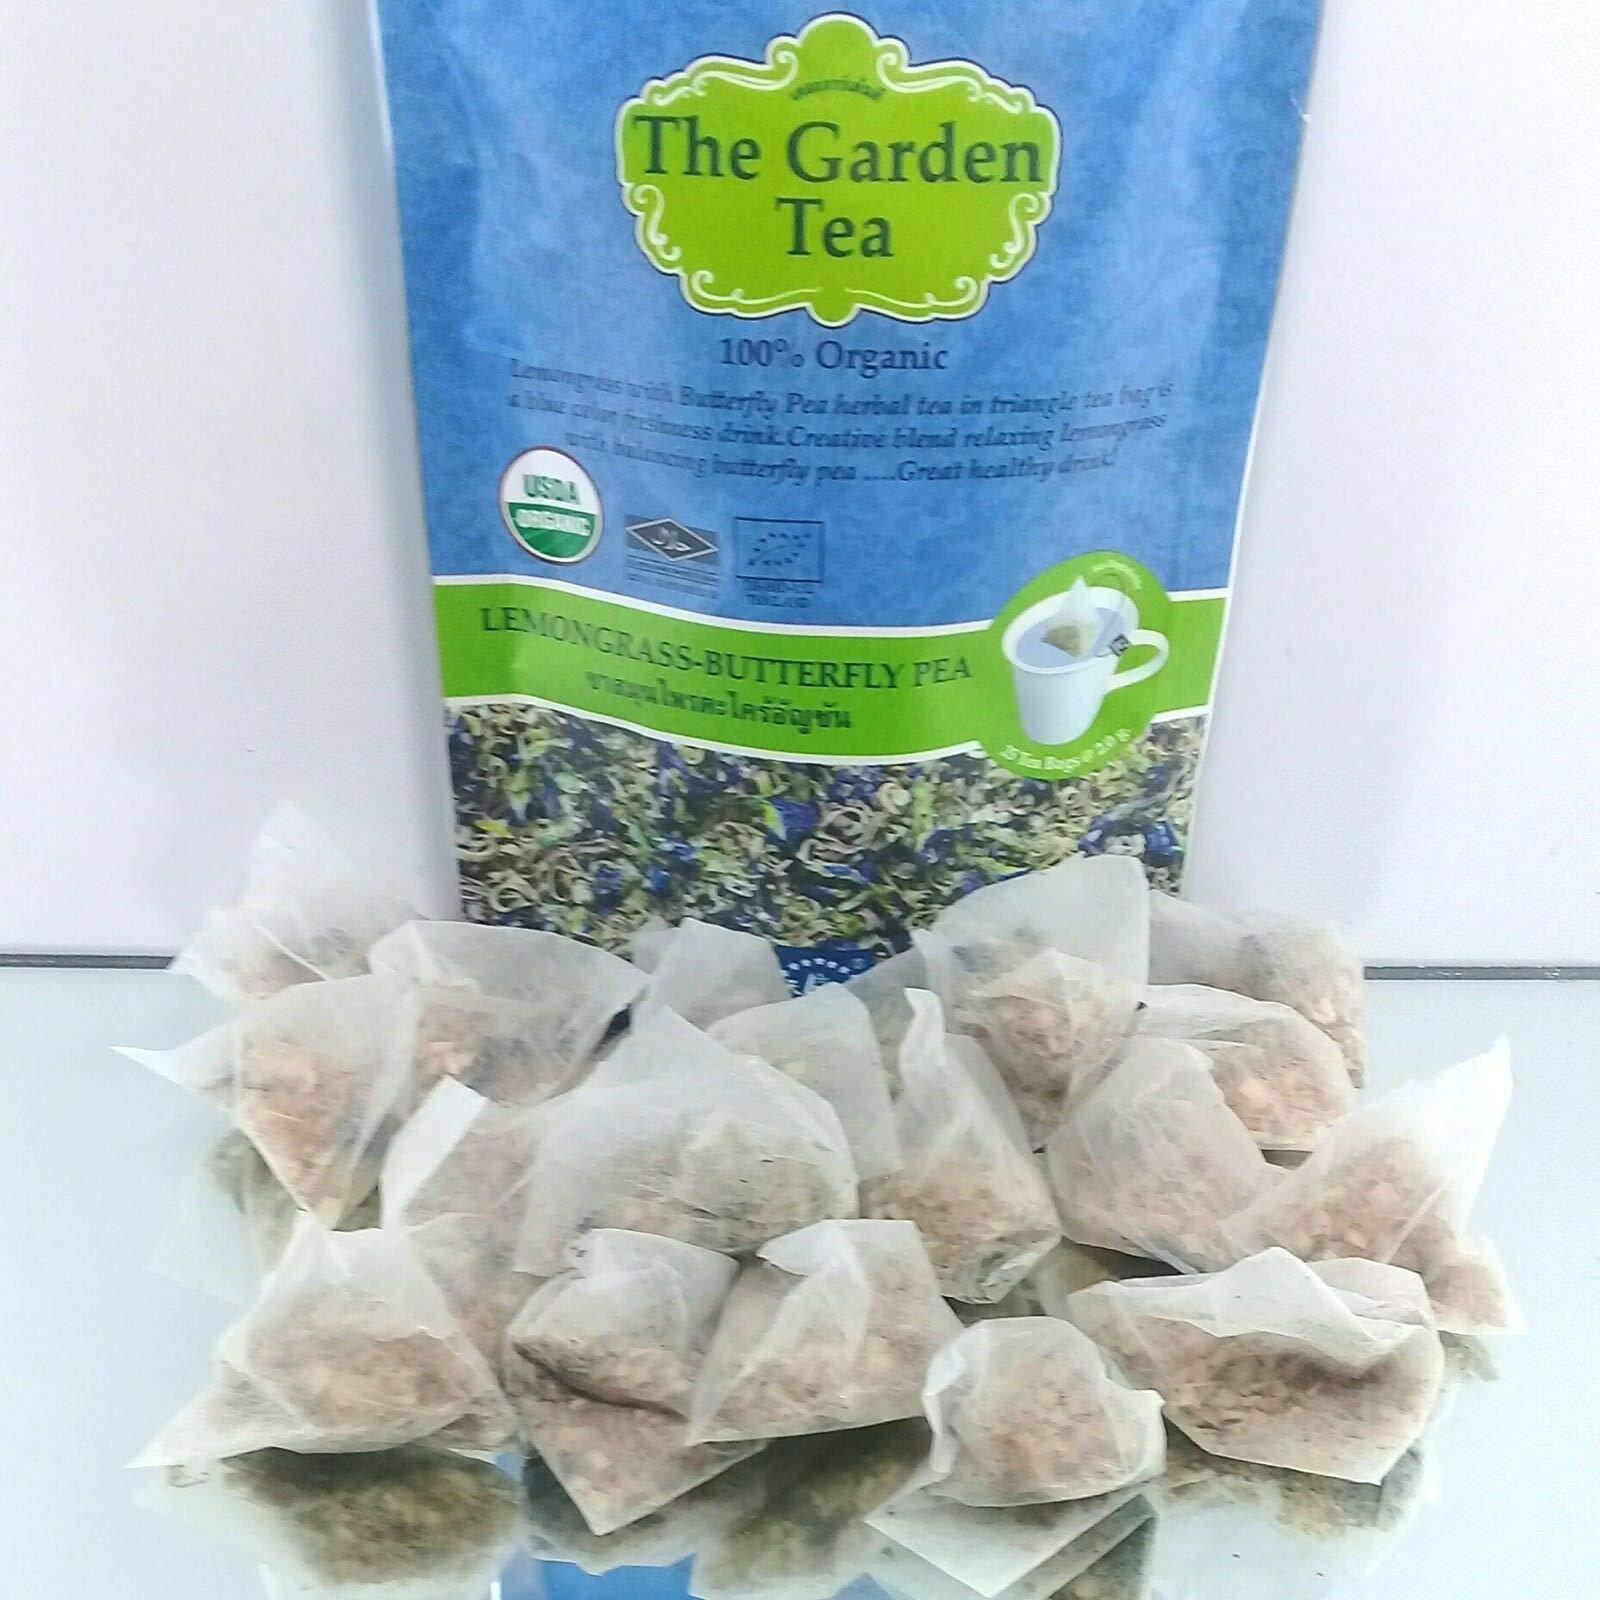 The Garden Tea Lemongrass-Butterfly Pea. Non Cafeine,Suwirun